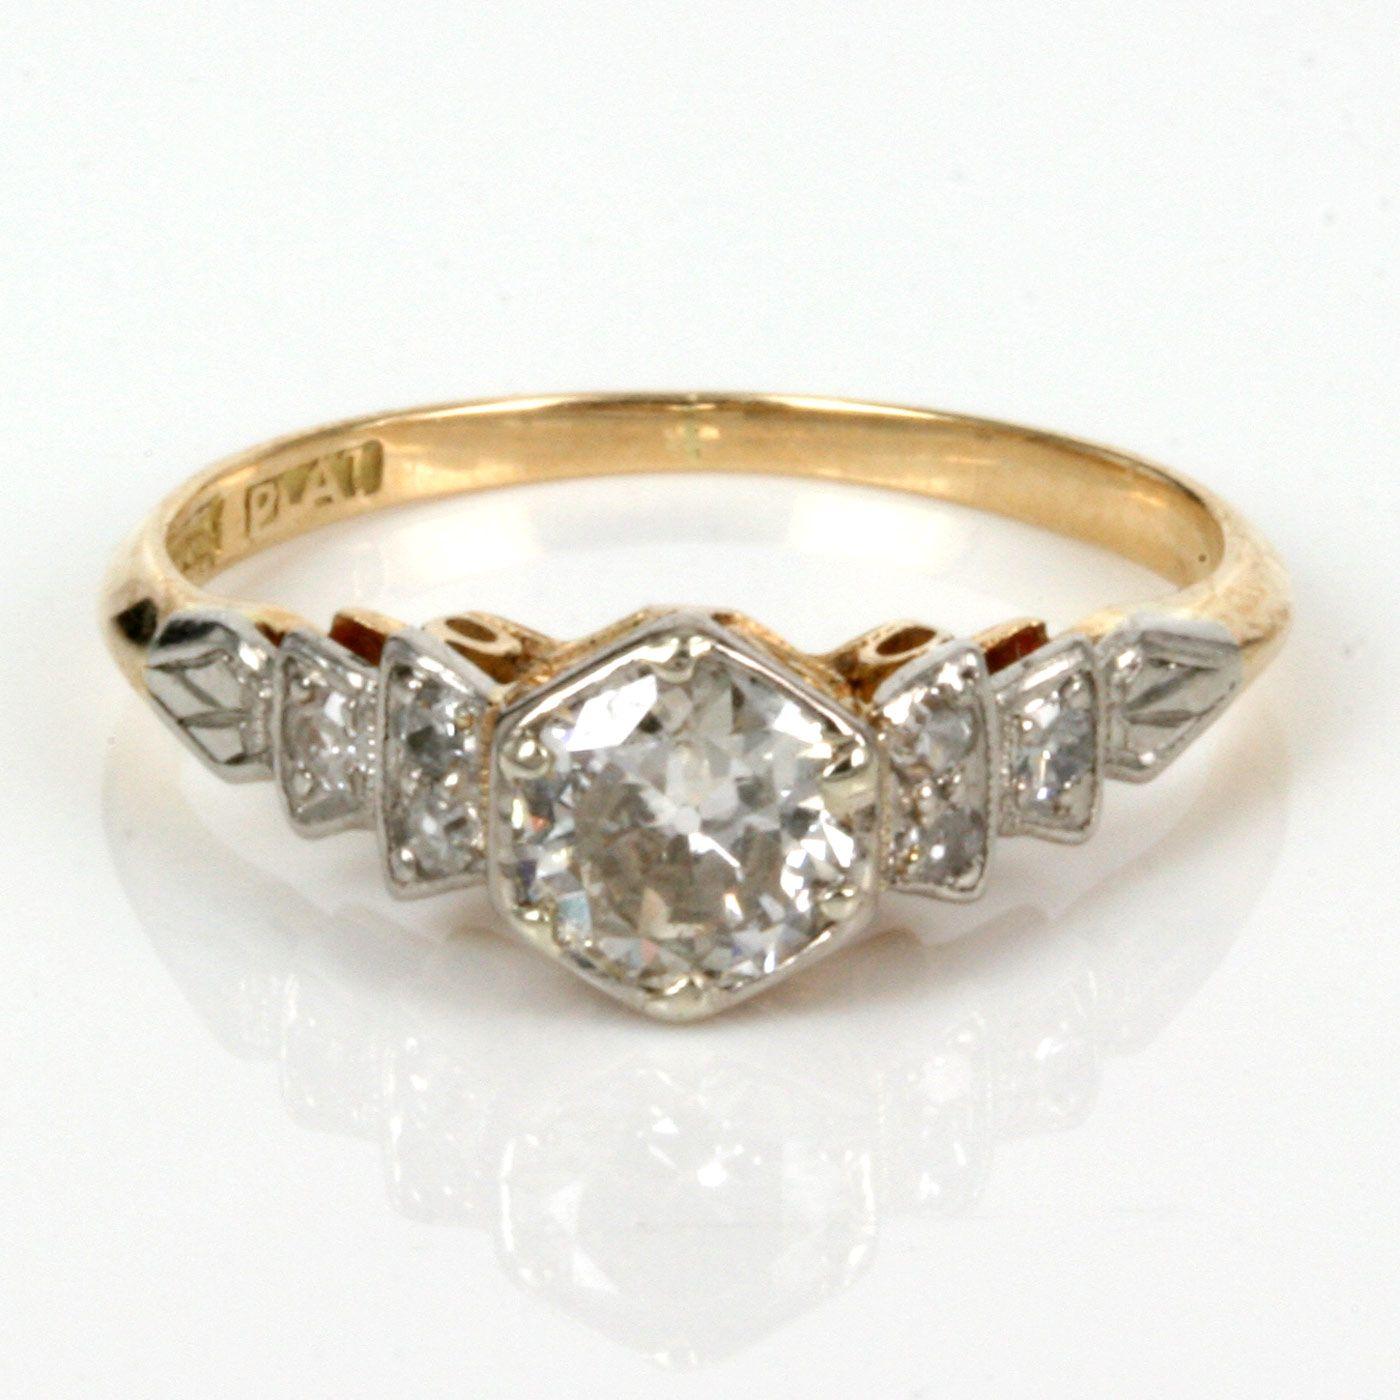 Antique Diamond Rings Buy Antique Diamond Engagement Ring